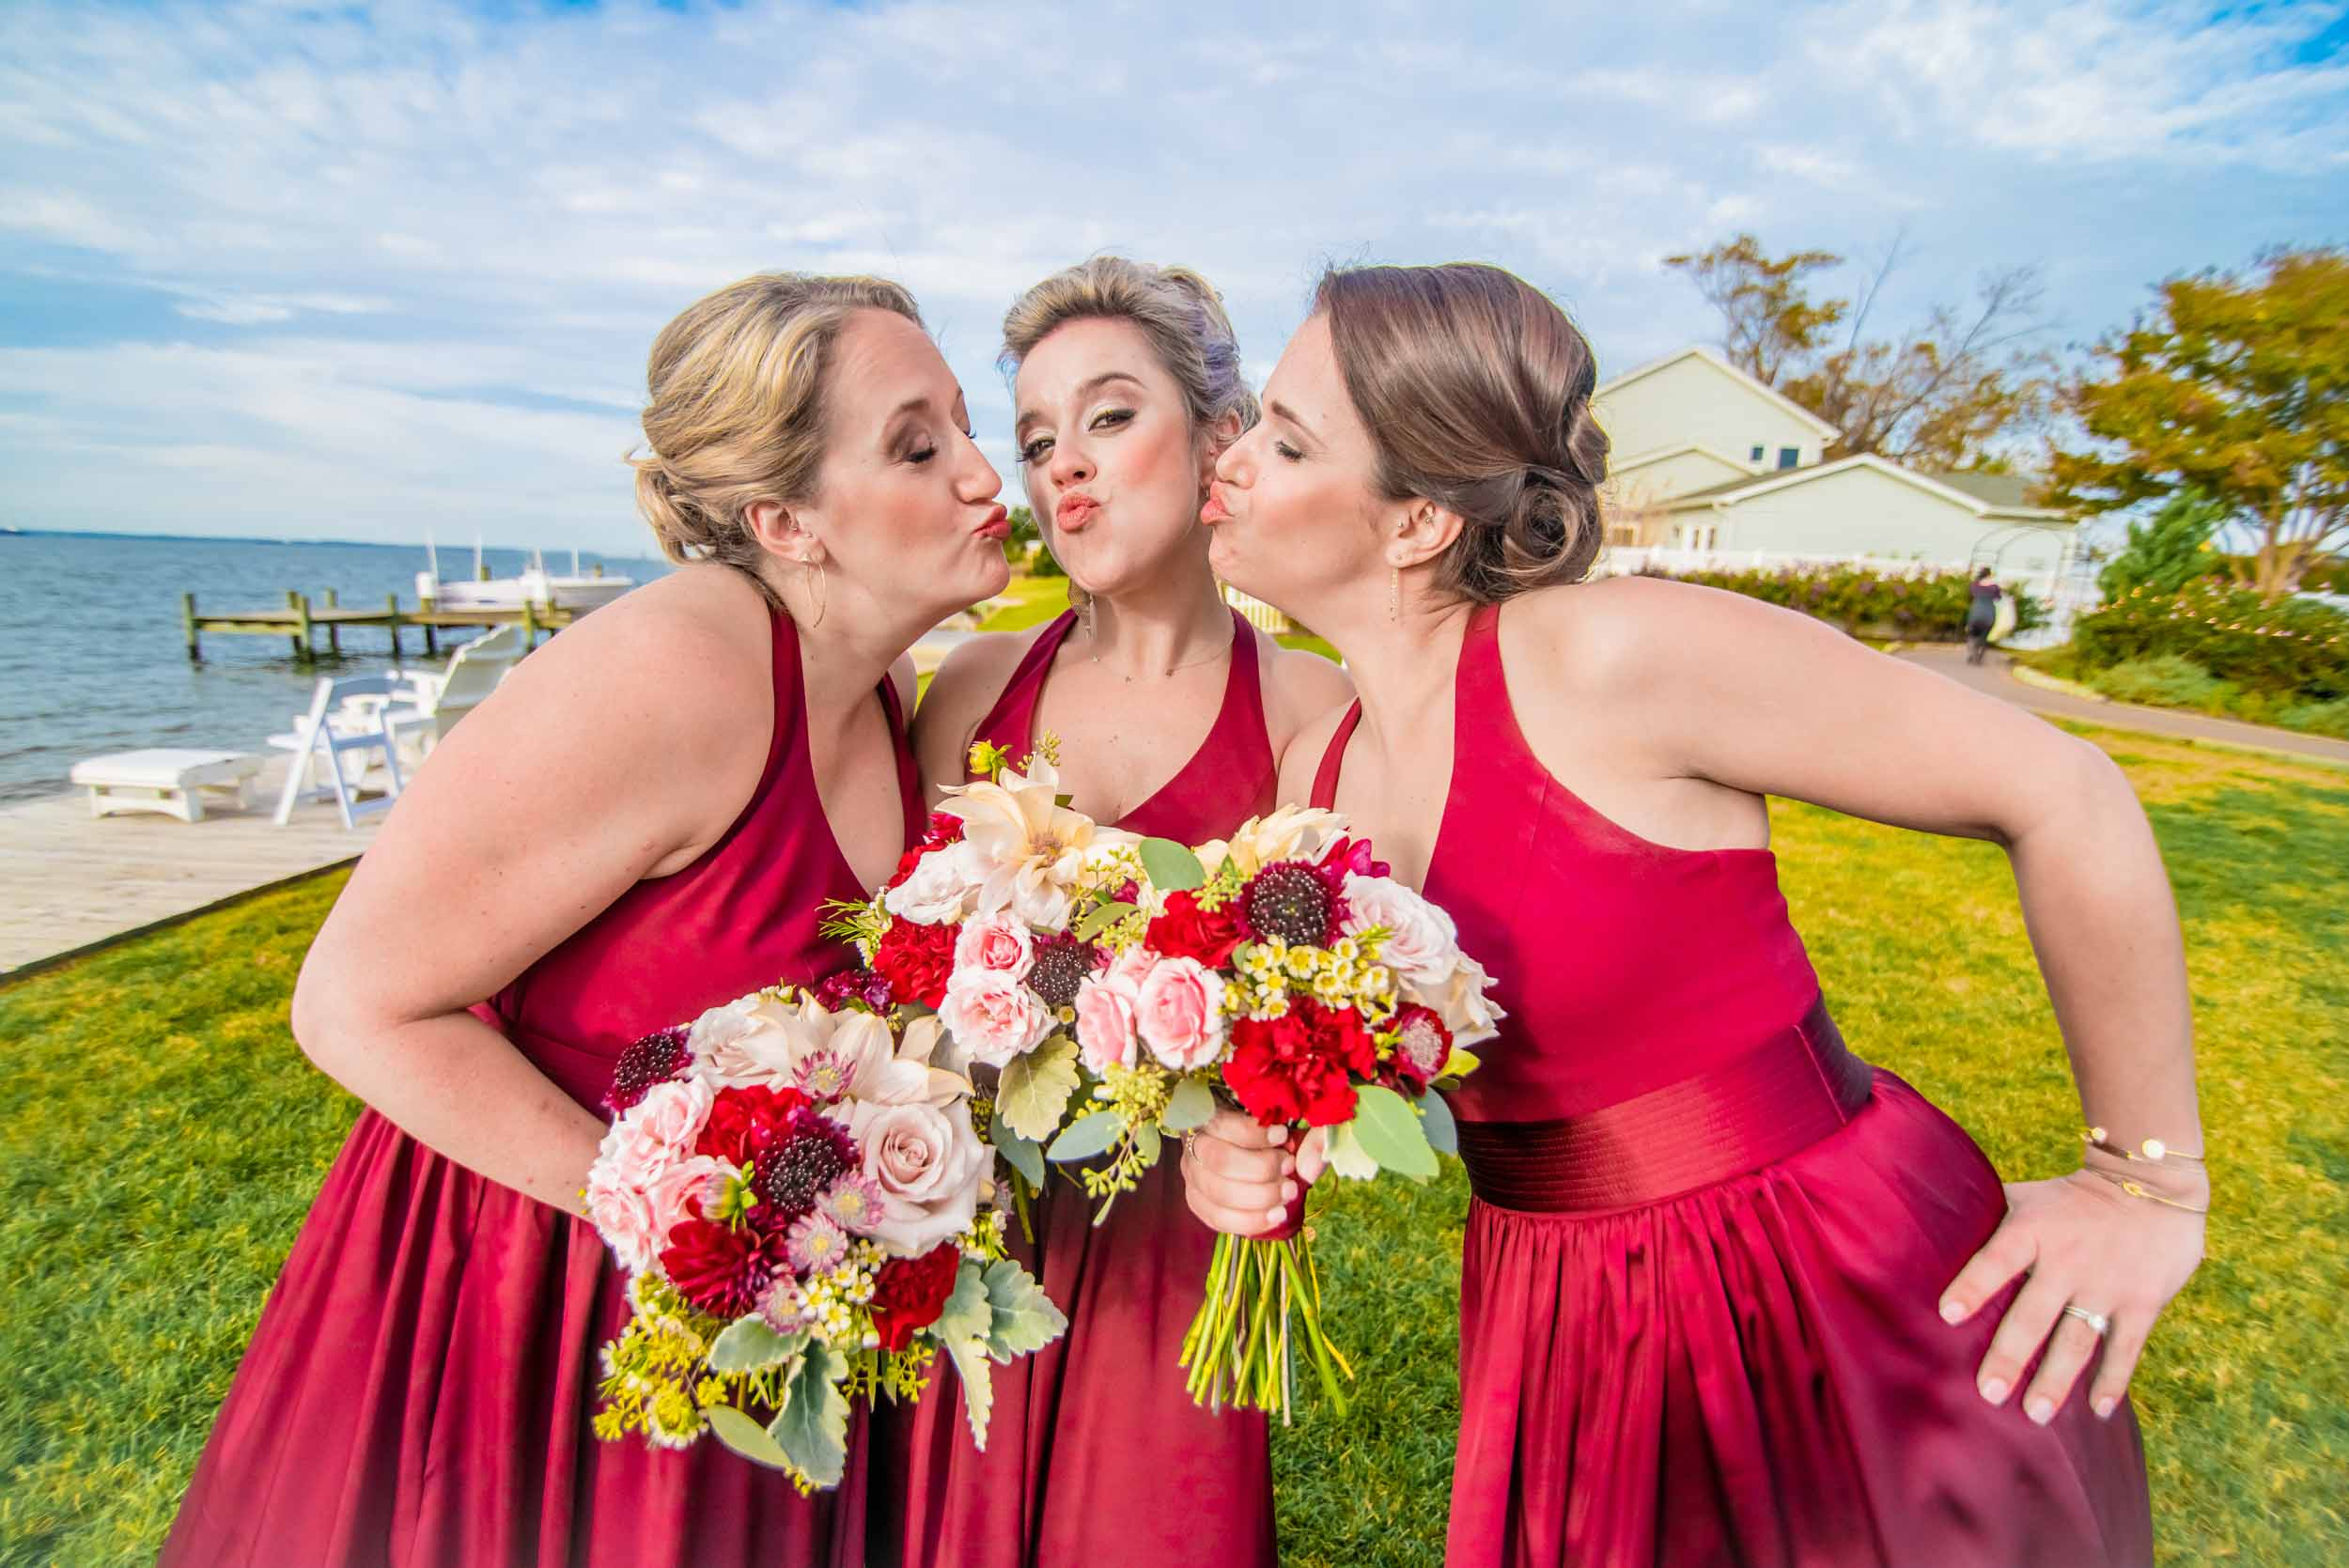 dc+metro+wedding+photographer+vadym+guliuk+photography+weddings+bridesmaids-2022.jpg